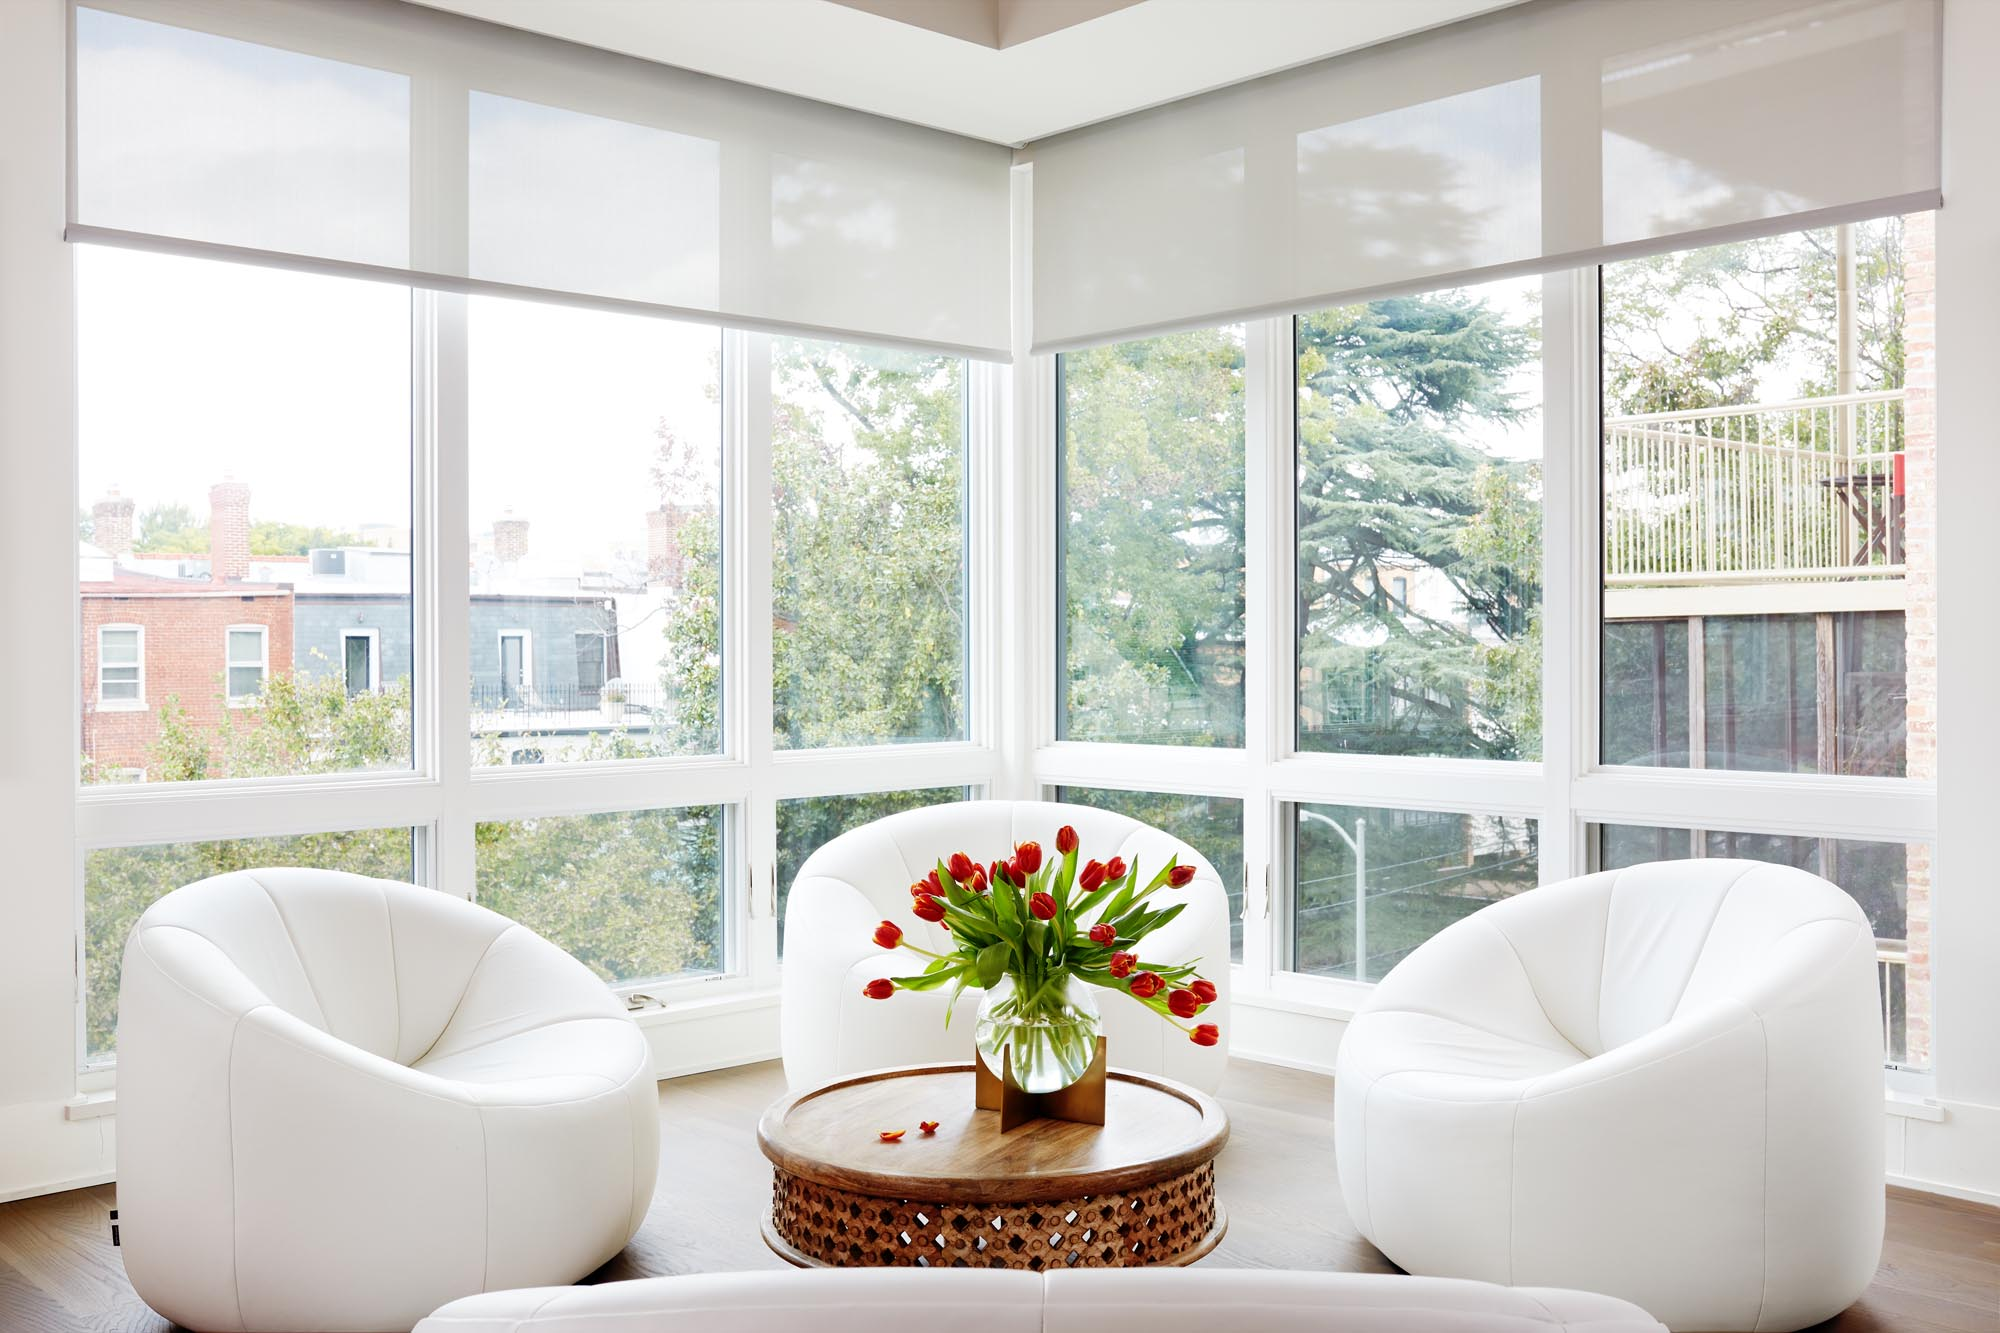 Boston living room with Glass walls design by Dane Austin Design